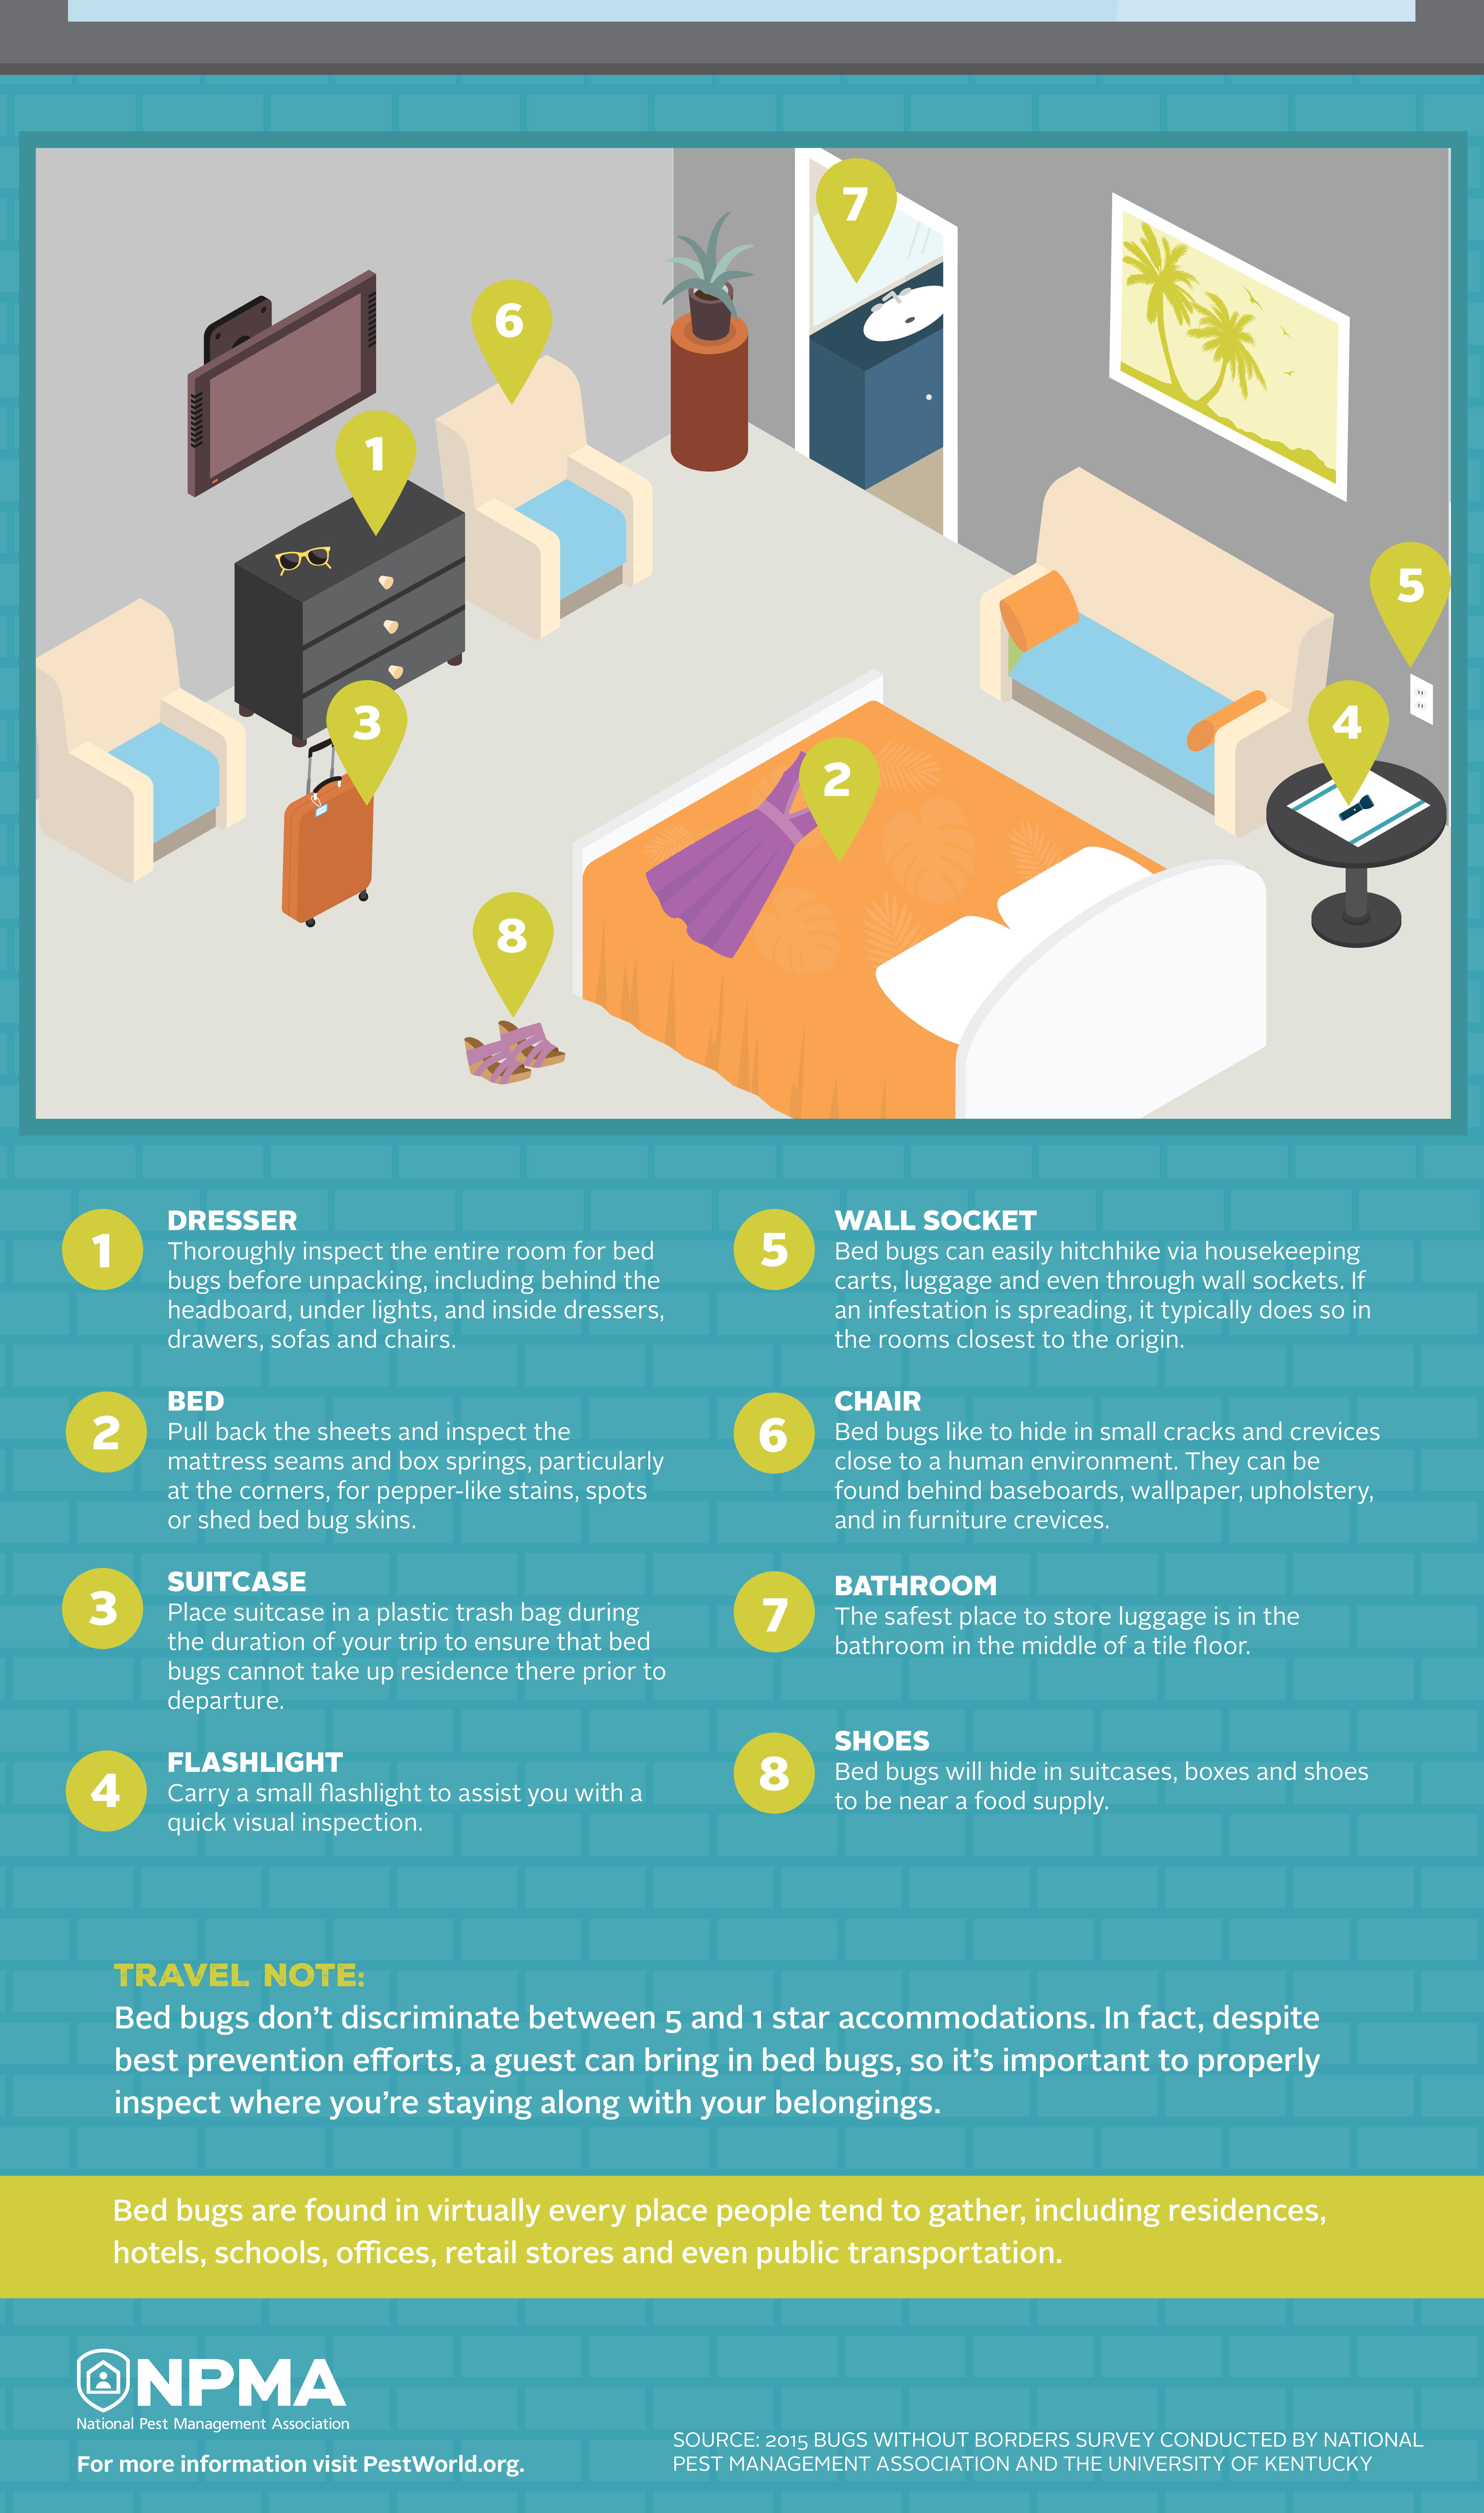 bedbug-hotel-infographic-053117